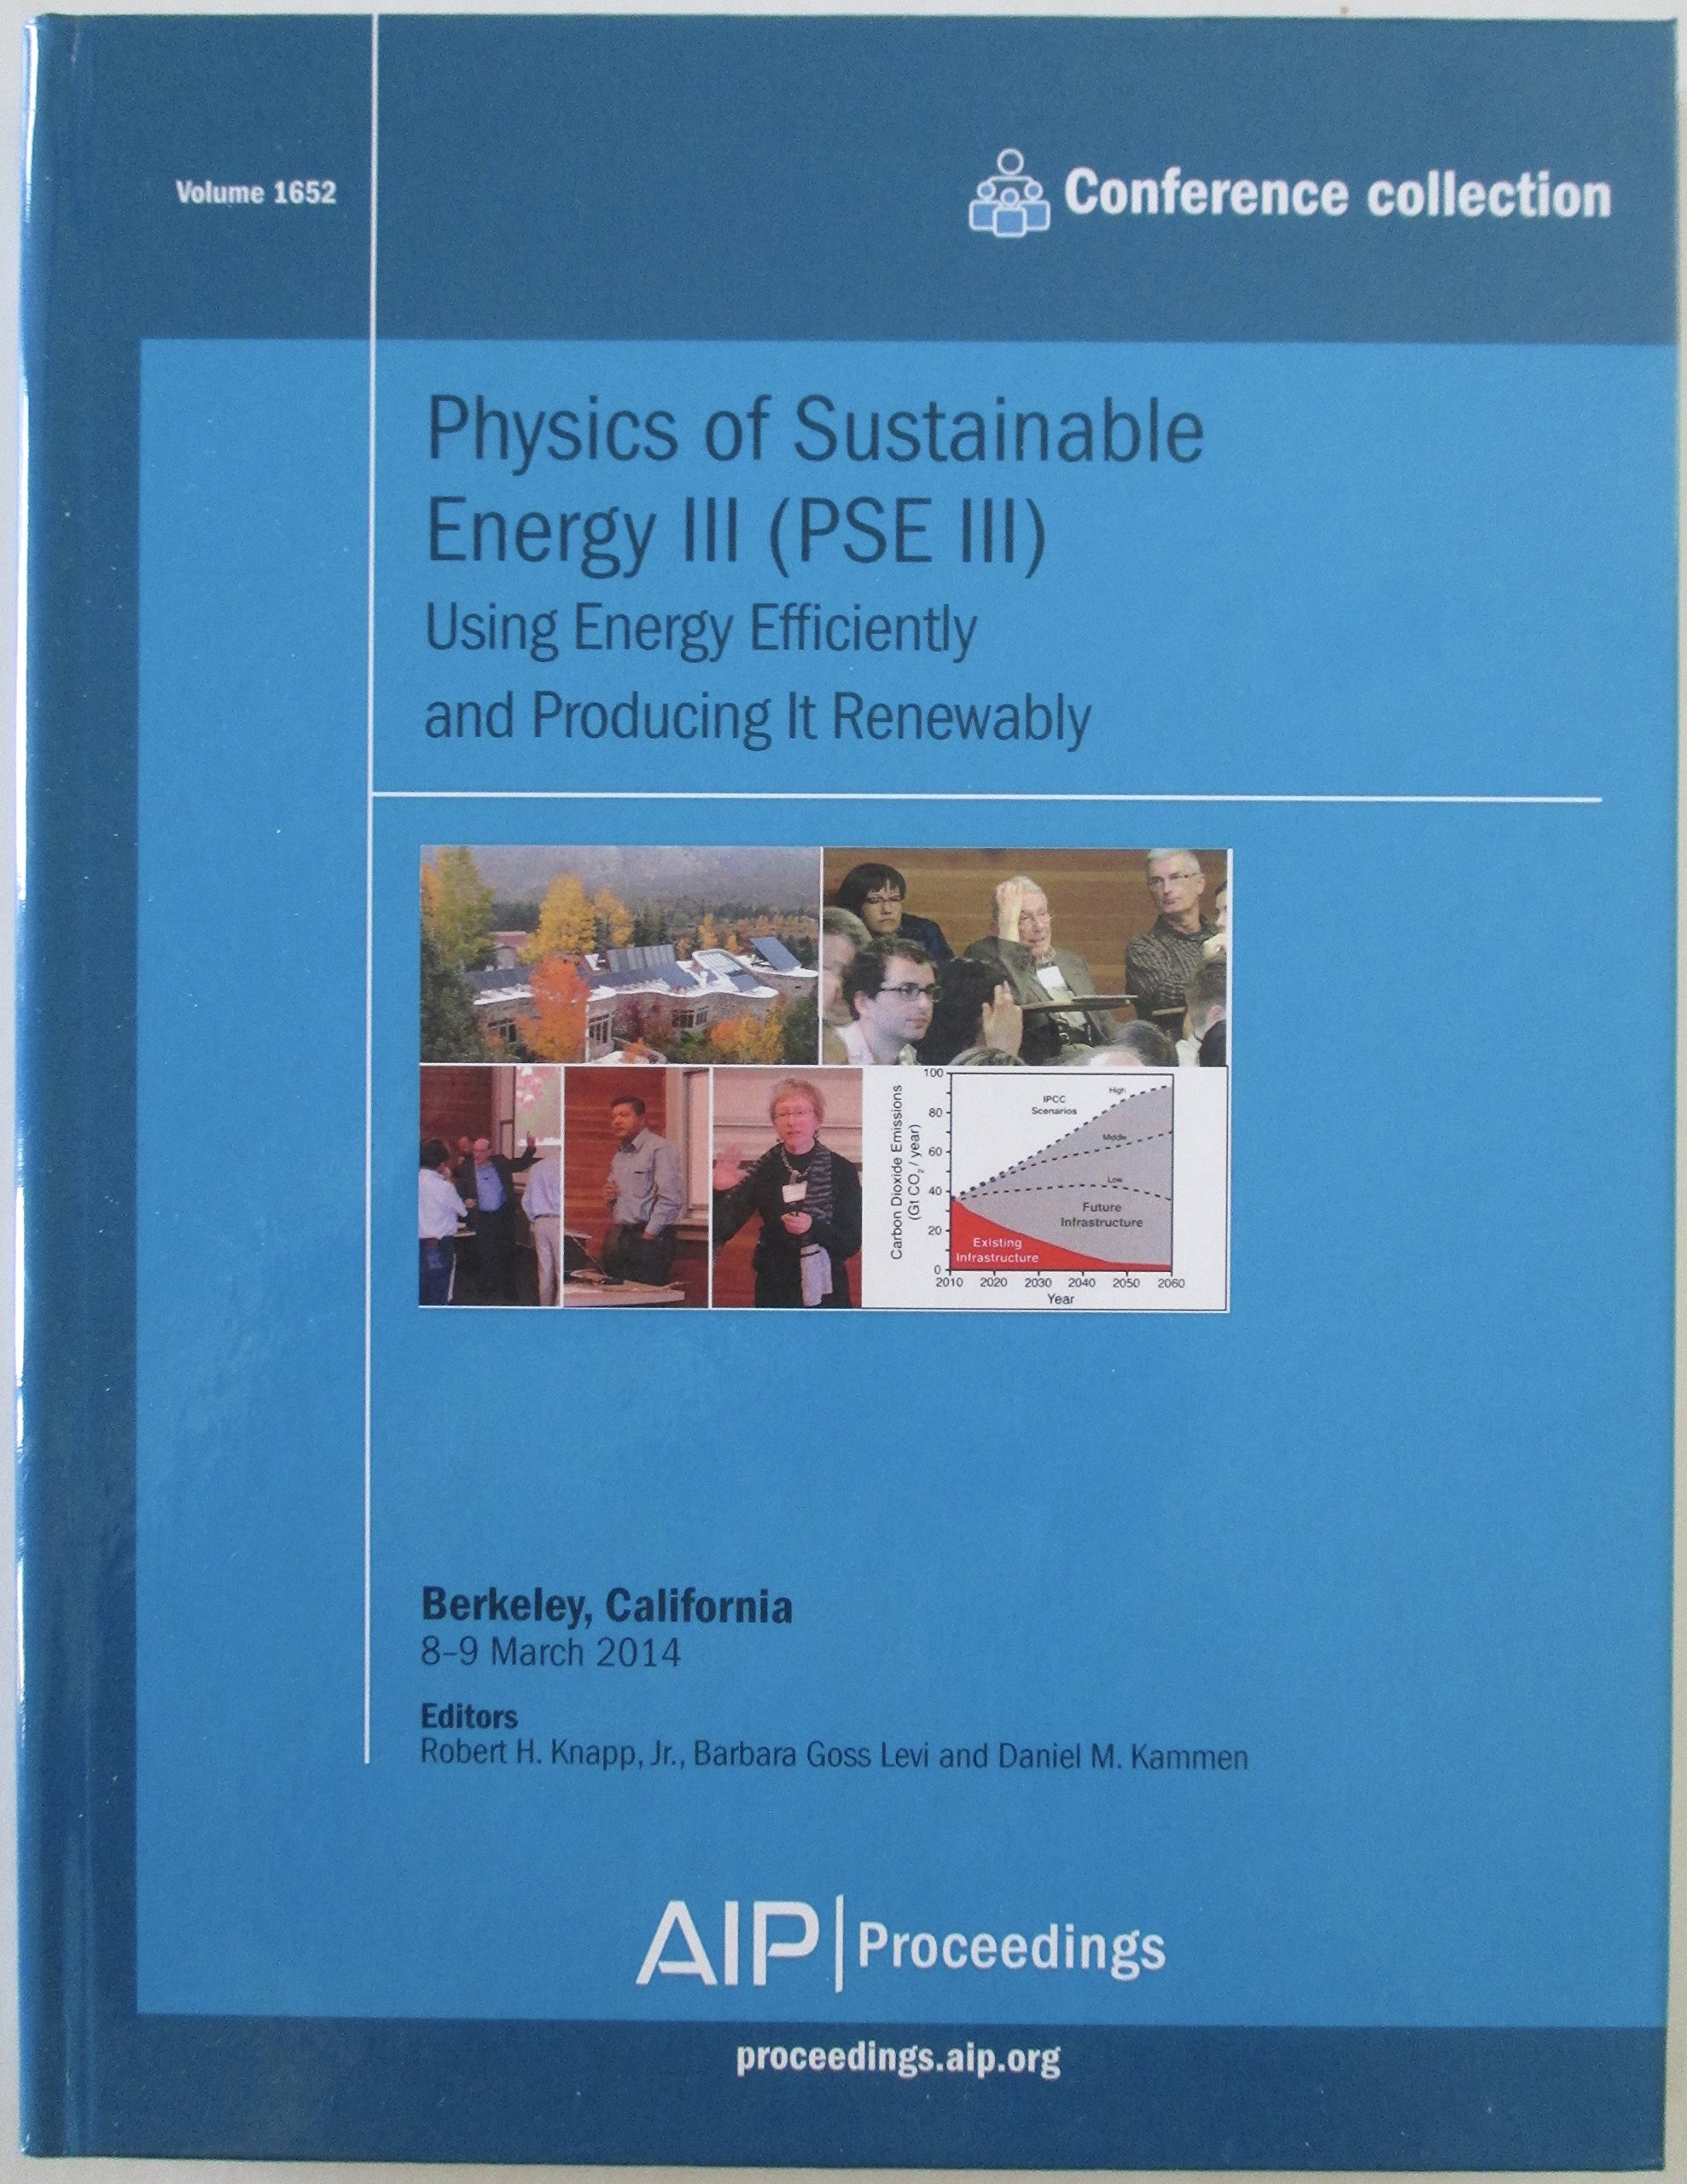 Physics of Sustainable Energy III: Conference Proceedings